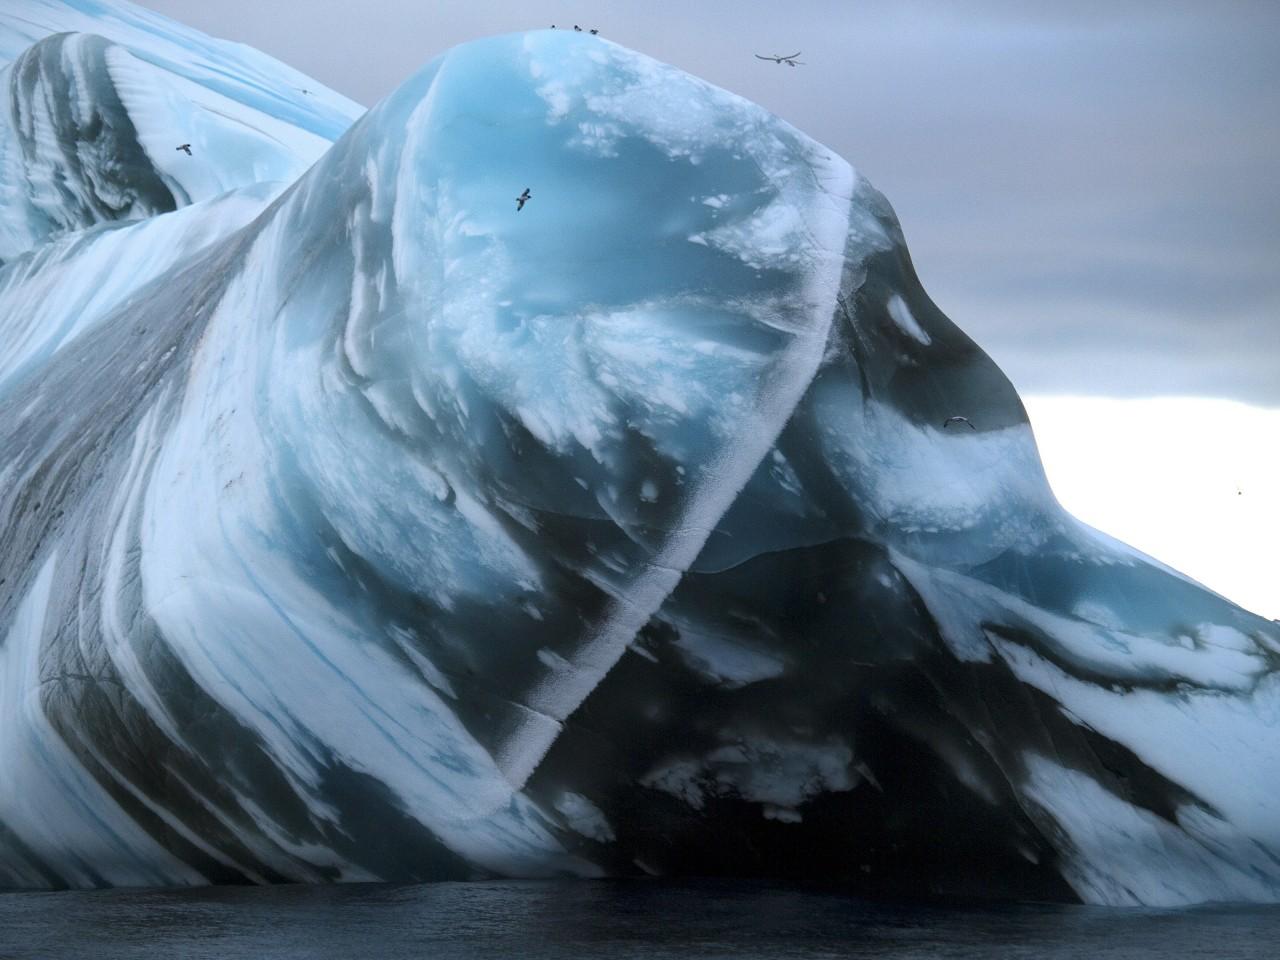 Un iceberg - Ethan Norris